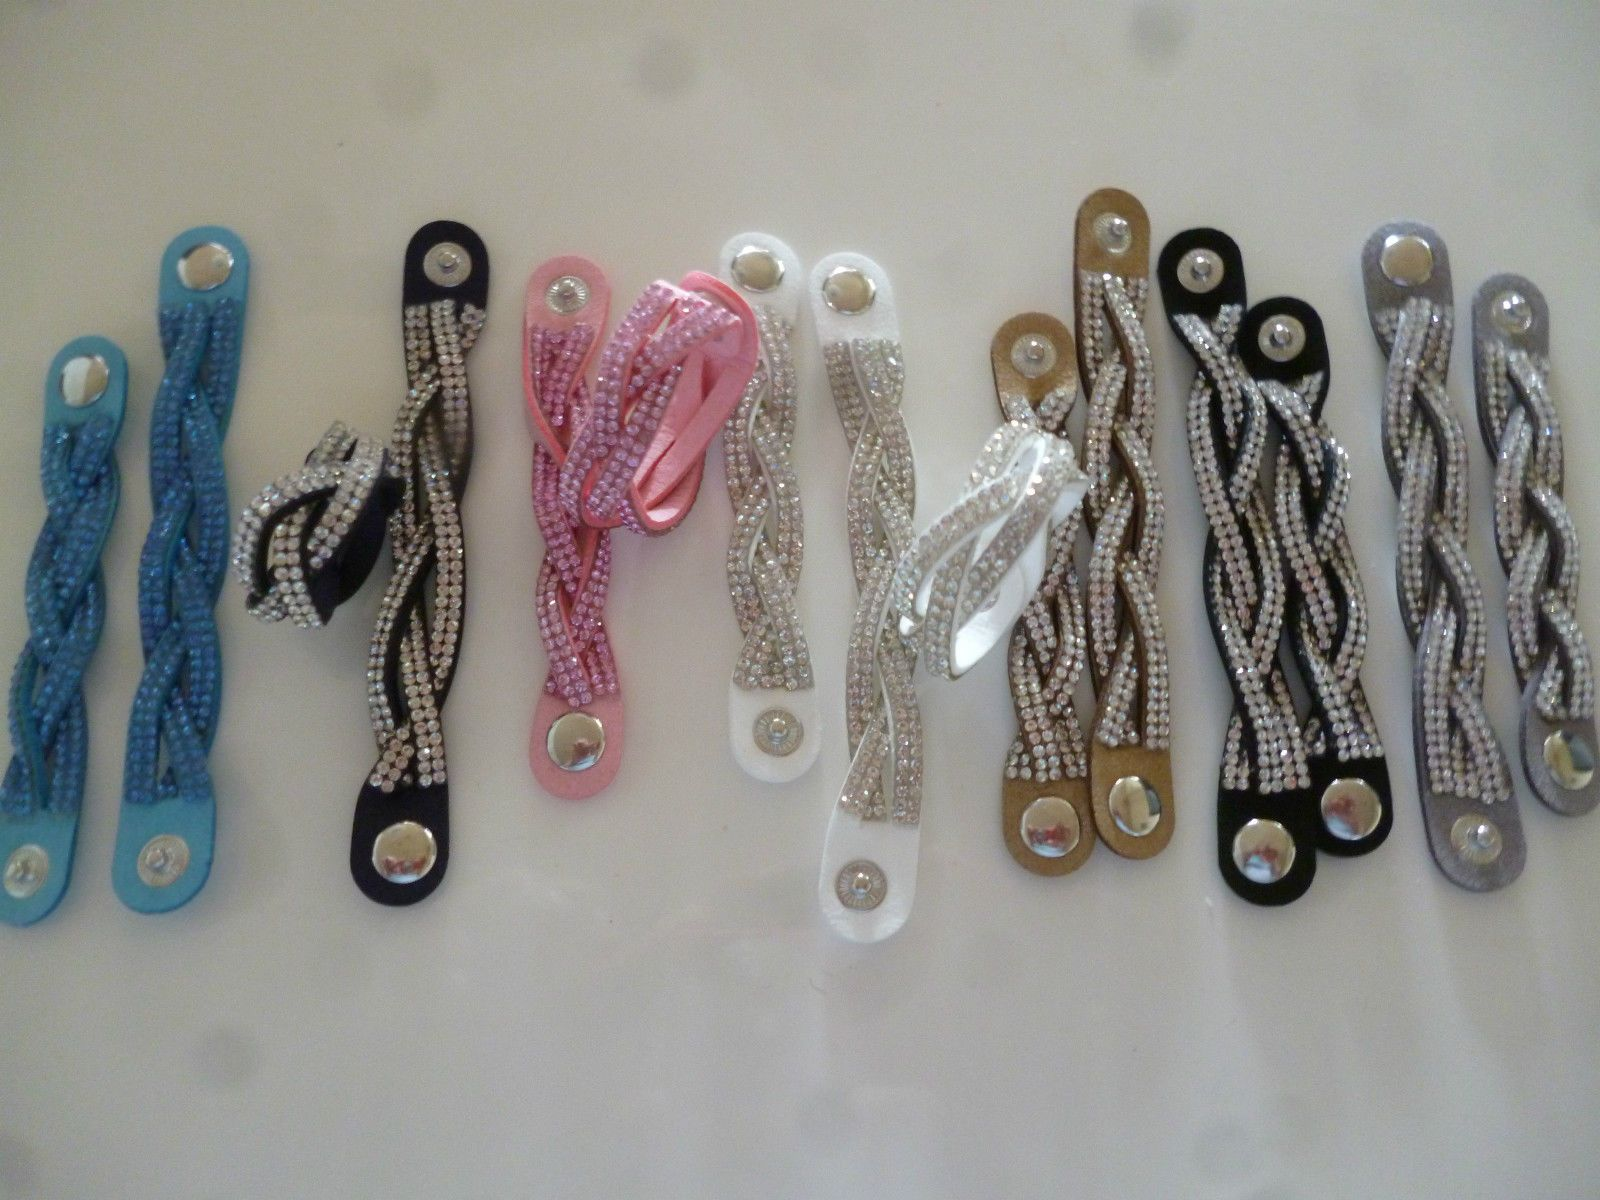 Schmuckring,Schmuck für Schal,Schalschmuck,Schmuck,Schal,Loop,Band,Flechtband, in Kleidung & Accessoires, Damen-Accessoires, Schals & Tücher   eBay